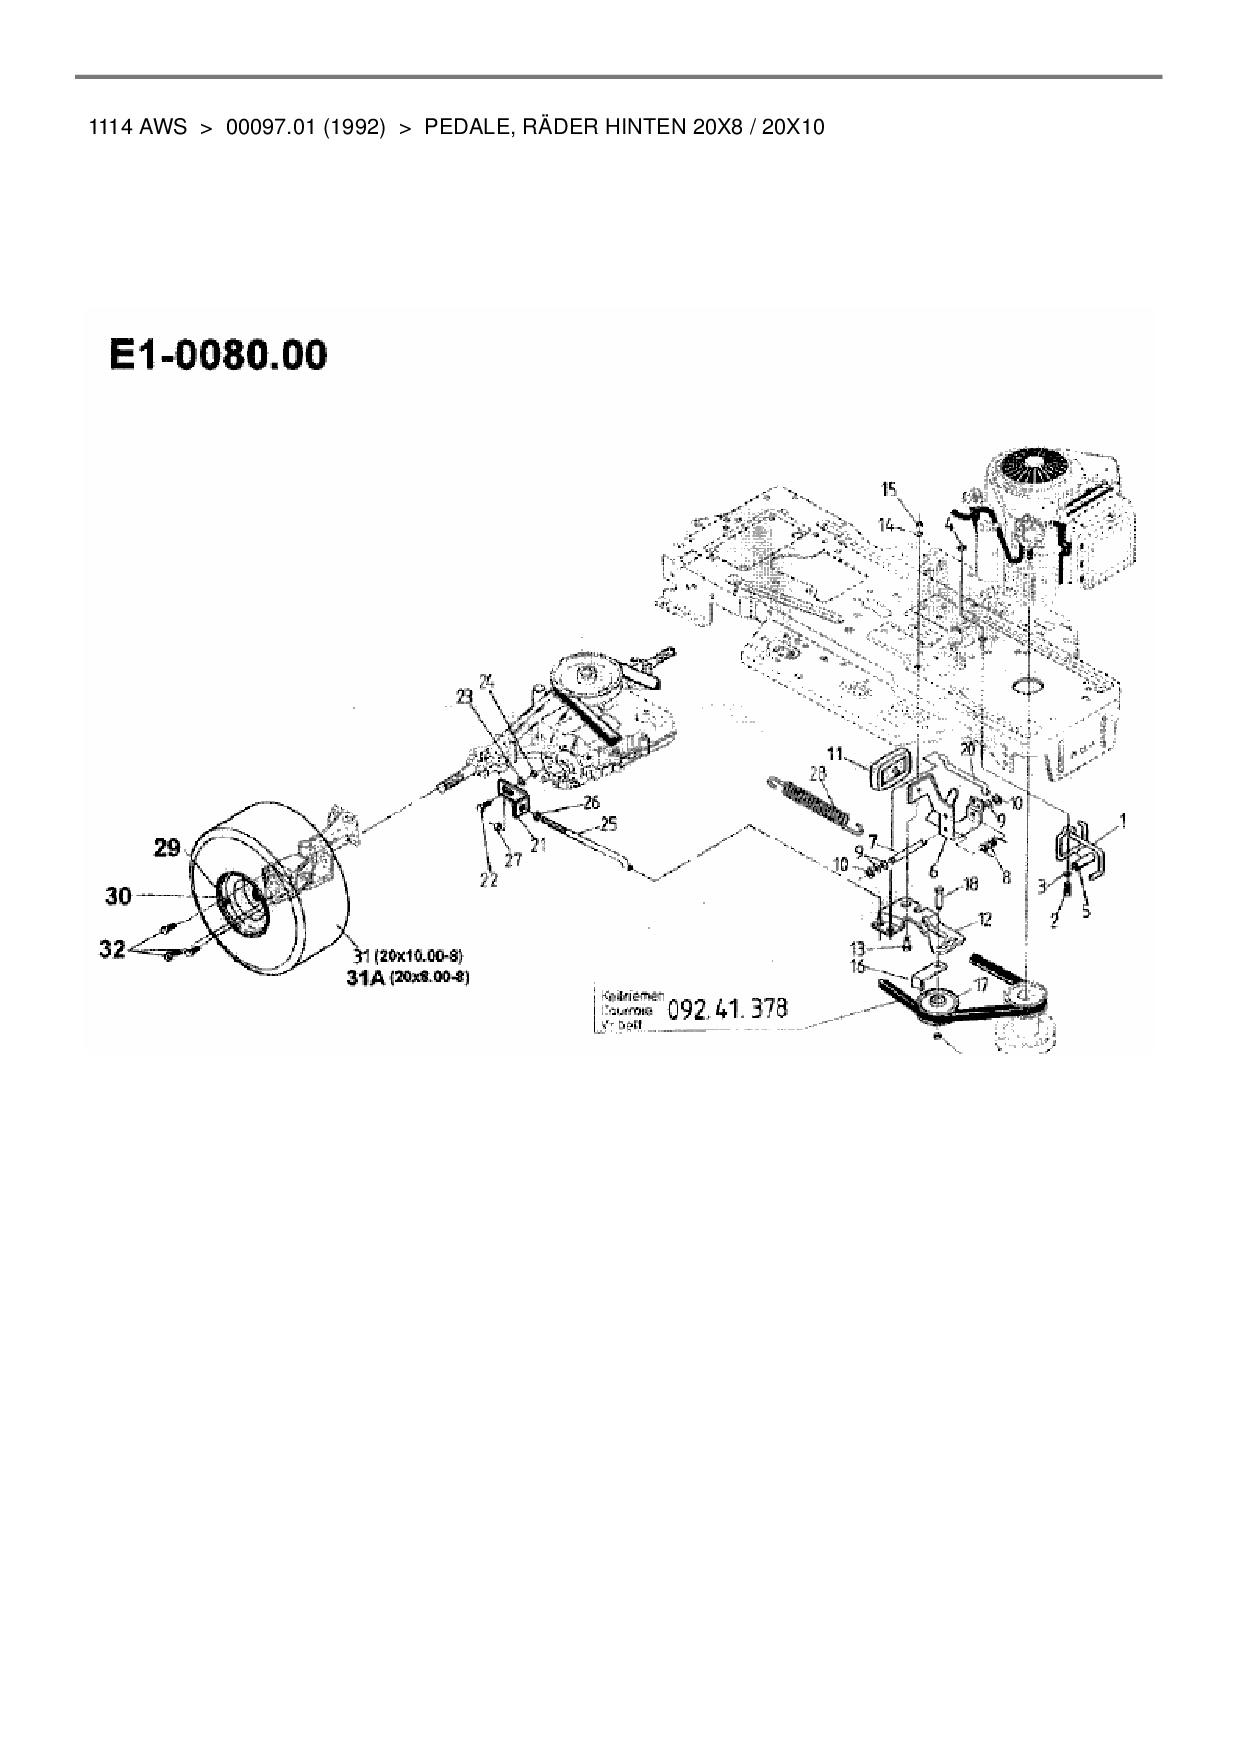 Keilriemen Fahrriemen passend Gutbrod 1114AWS Rasentraktor